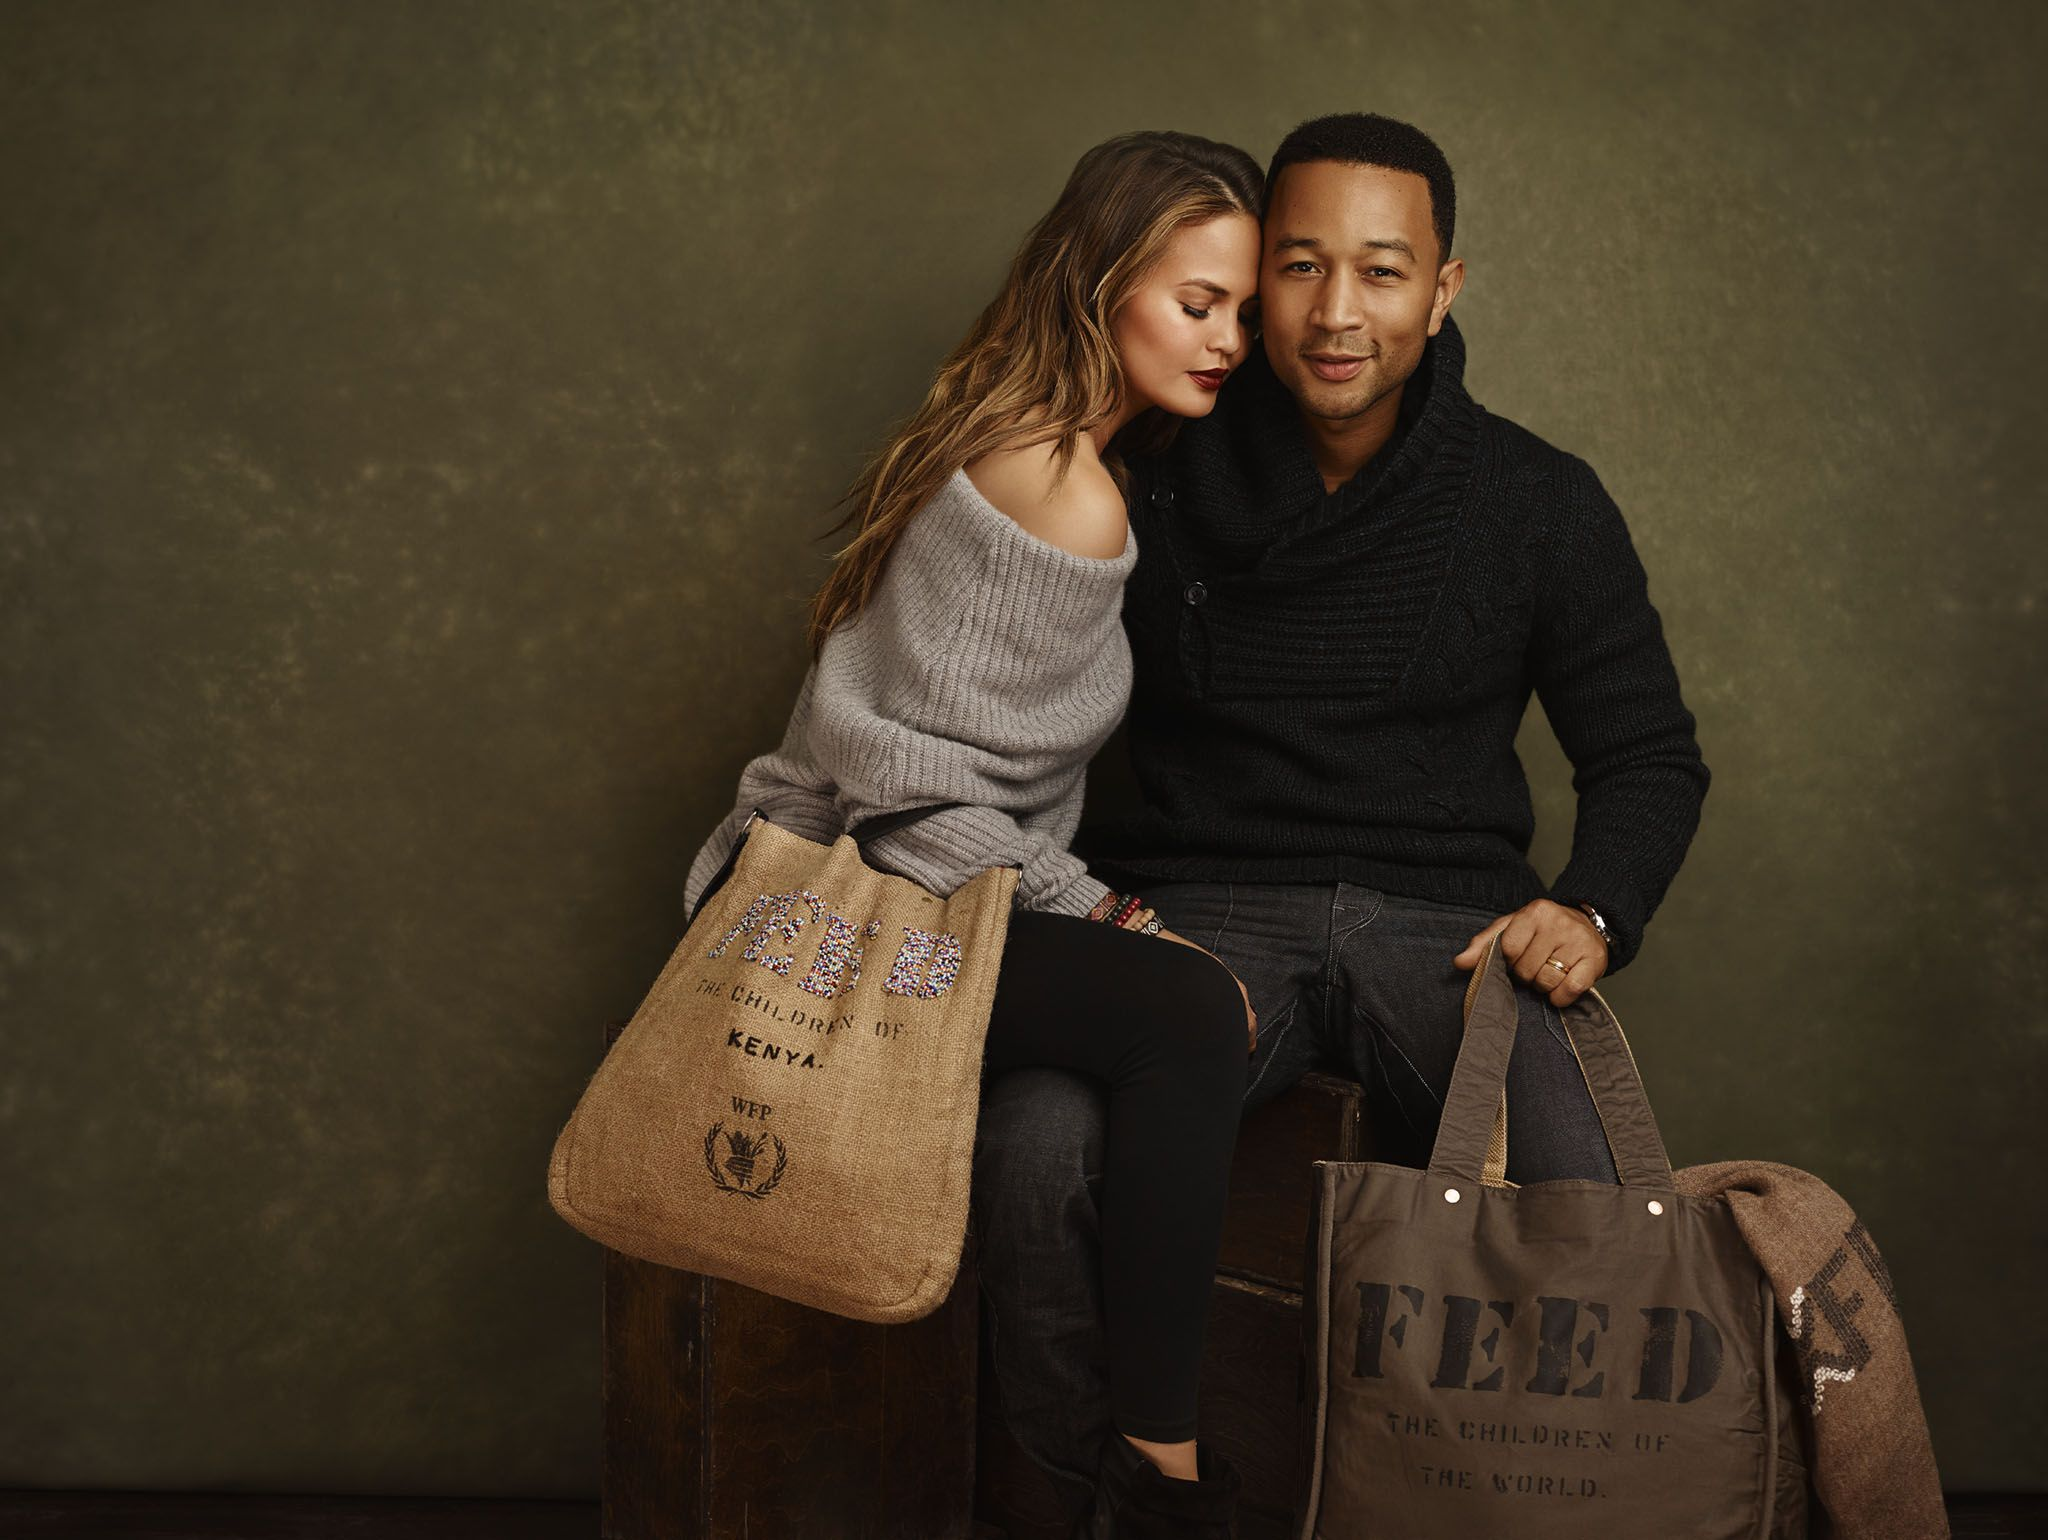 John Legend And Chrissy Teigen For Feed Projects Model Musician